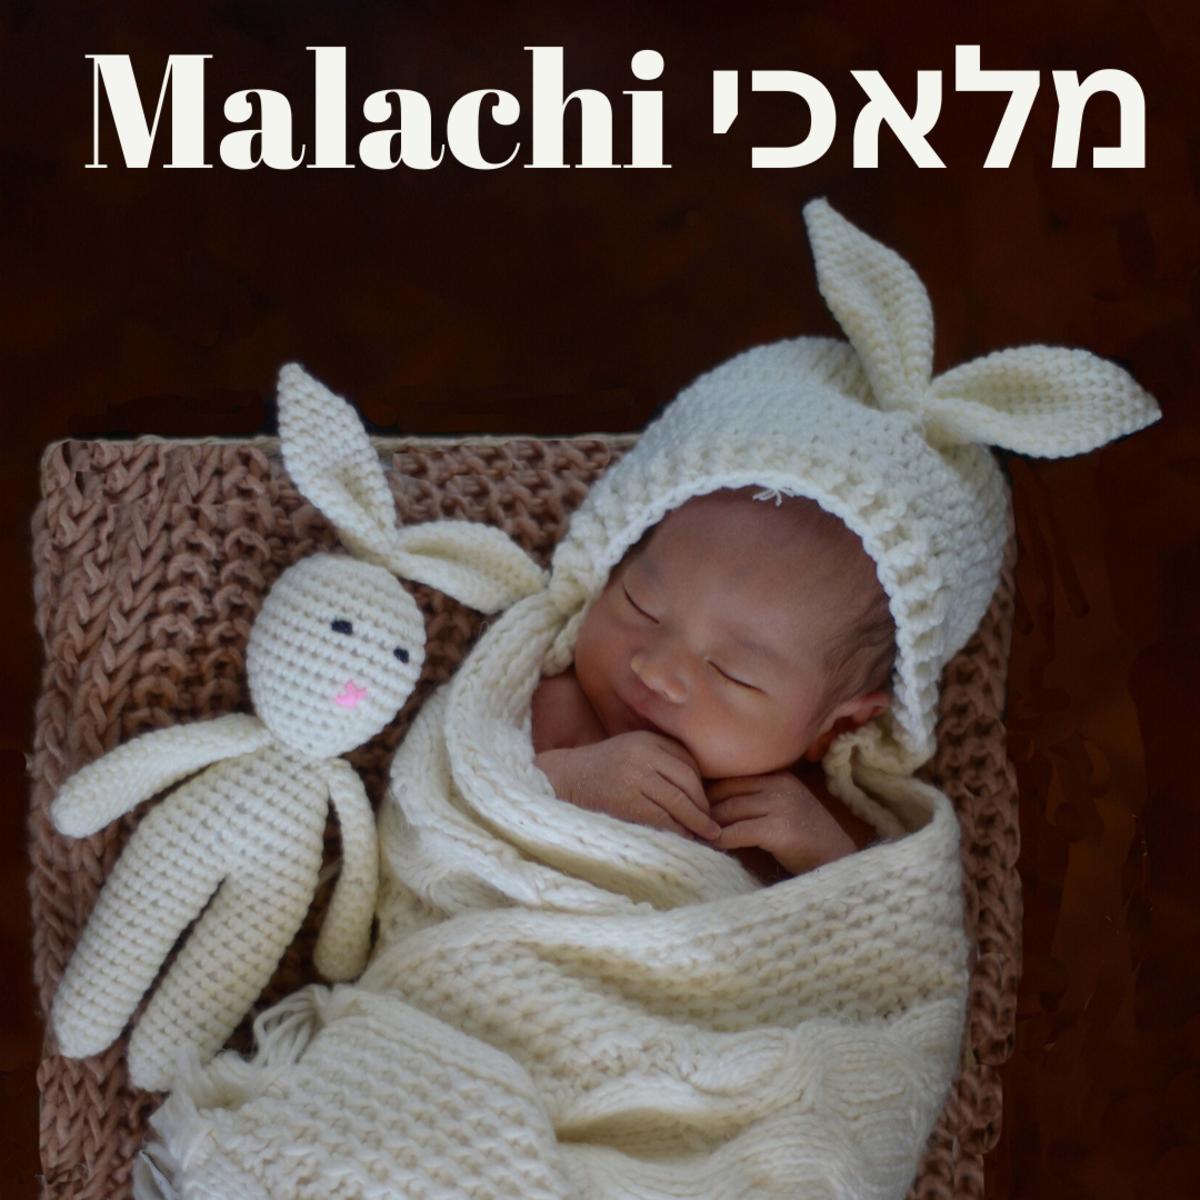 Baby Malachi מלאכי